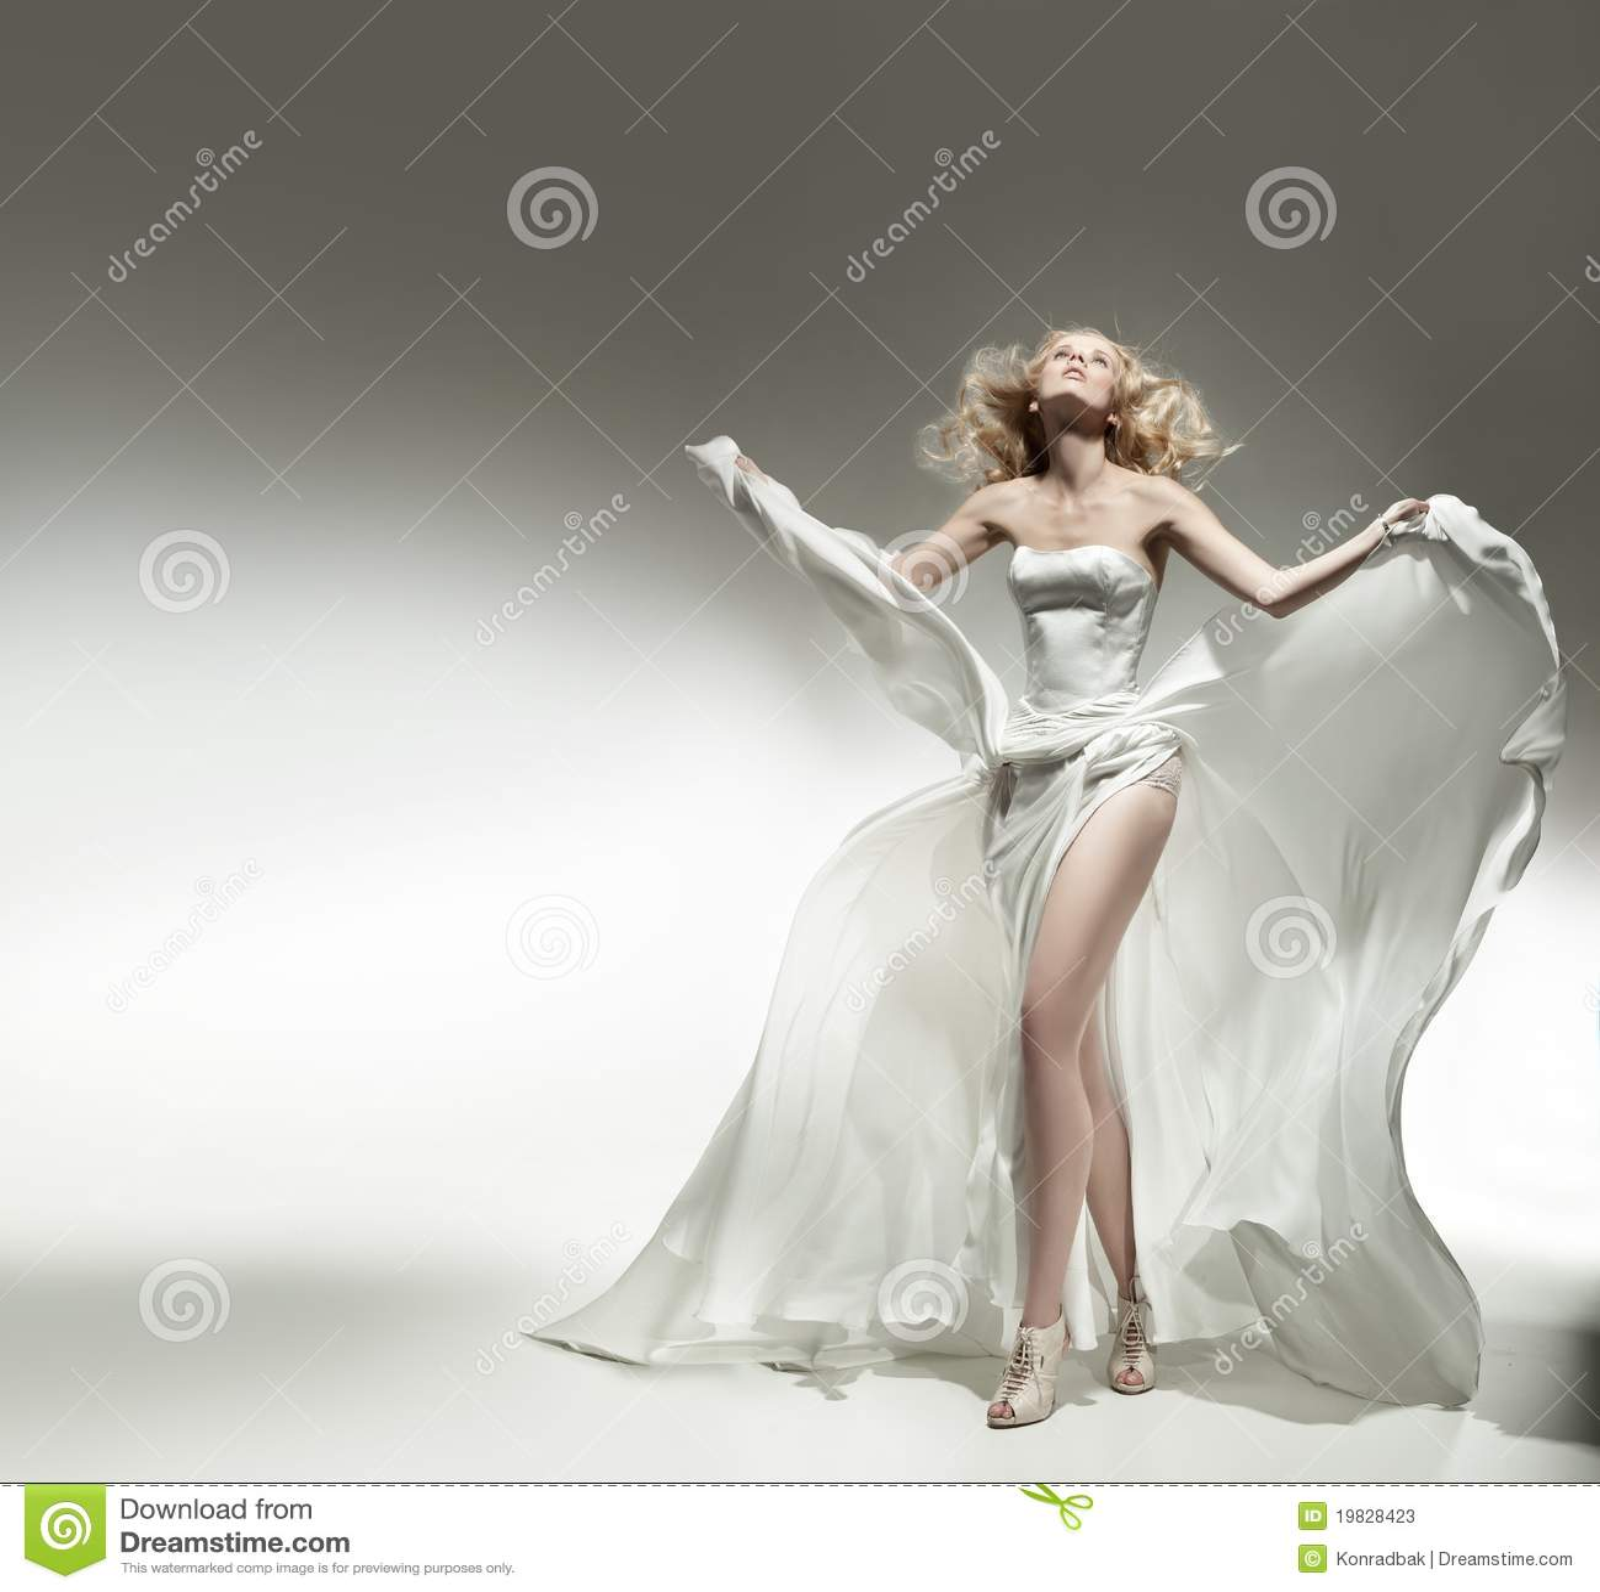 Romantic blonde beauty